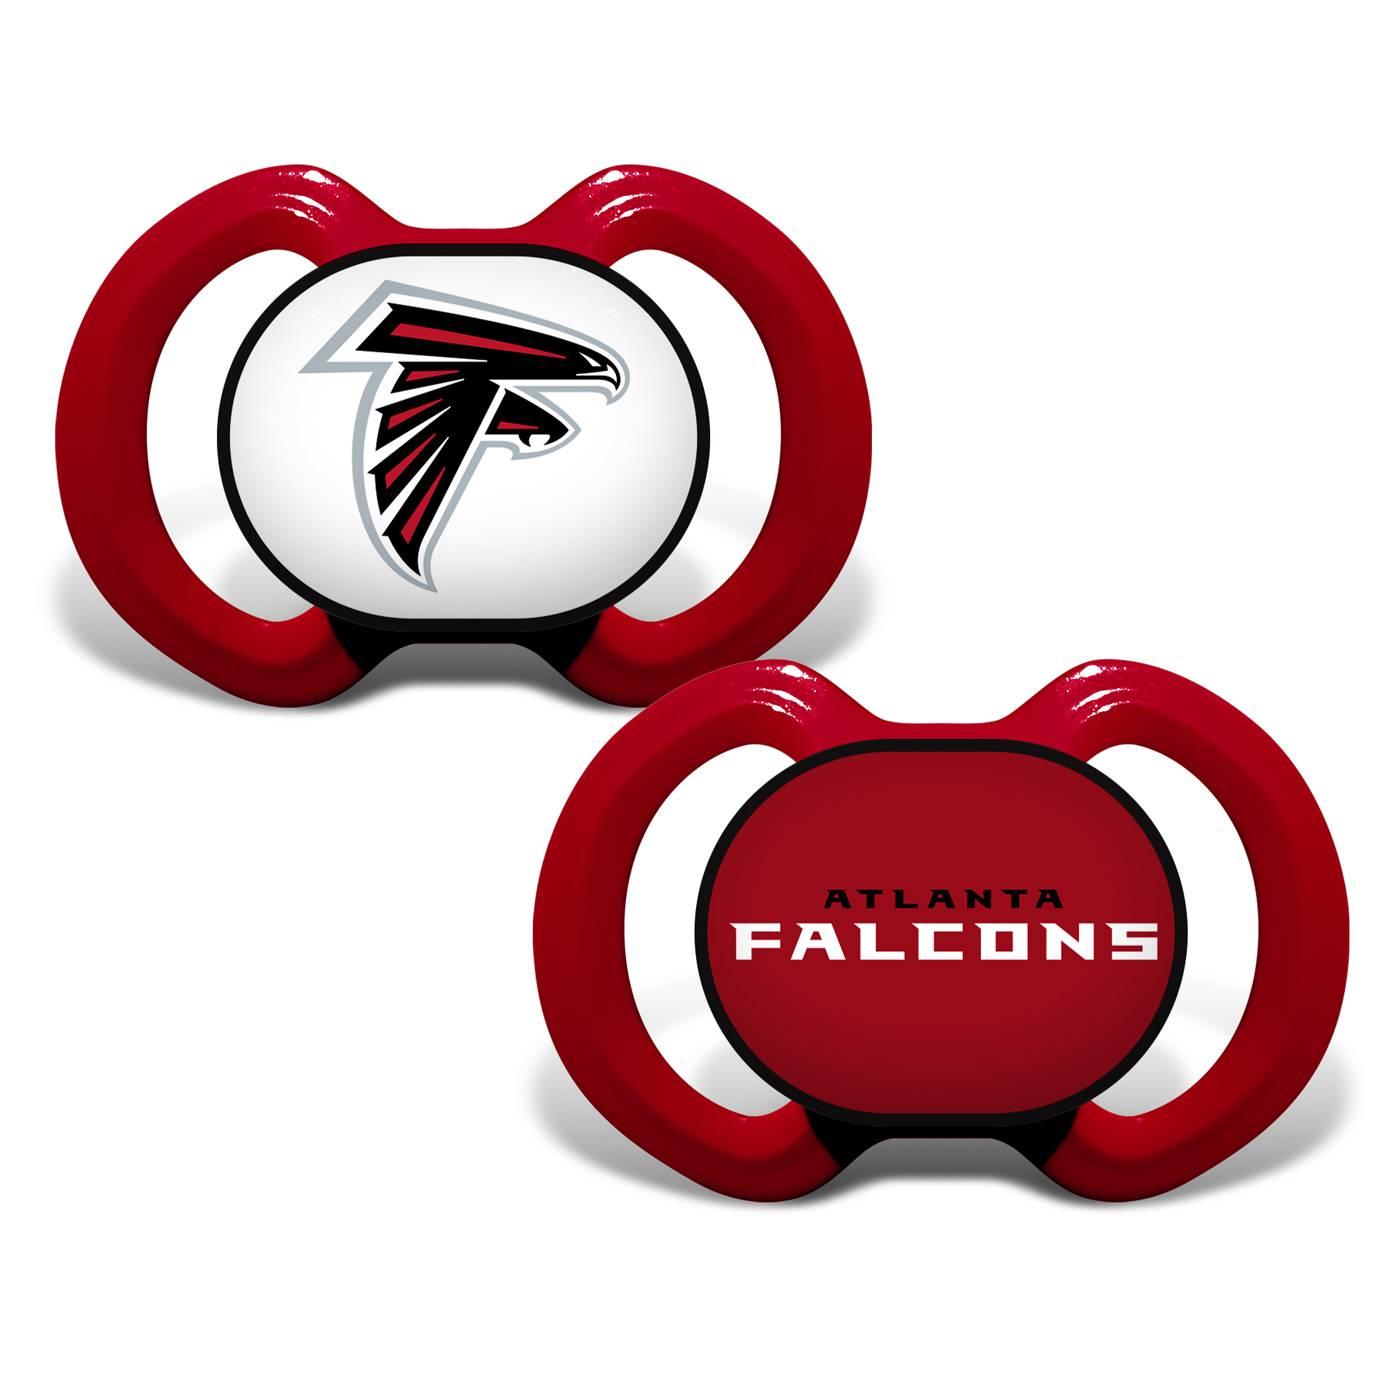 innovative design 6c238 6990f Atlanta Falcons Baby Pacifier 2-Pack